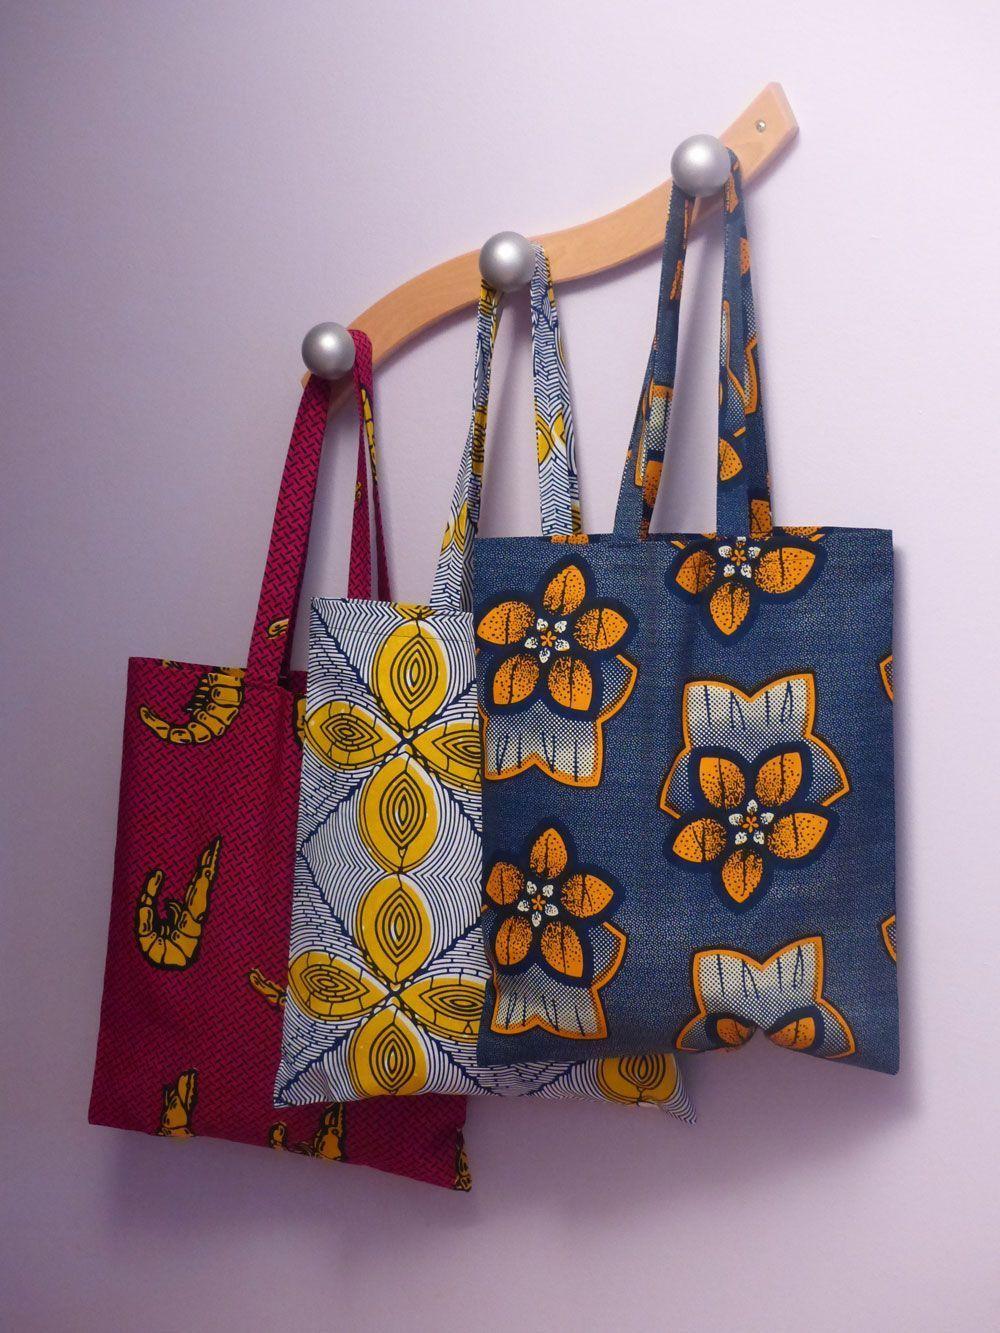 Batik Fashion Inspiration _ Batik Fashion in 2020 Fabric